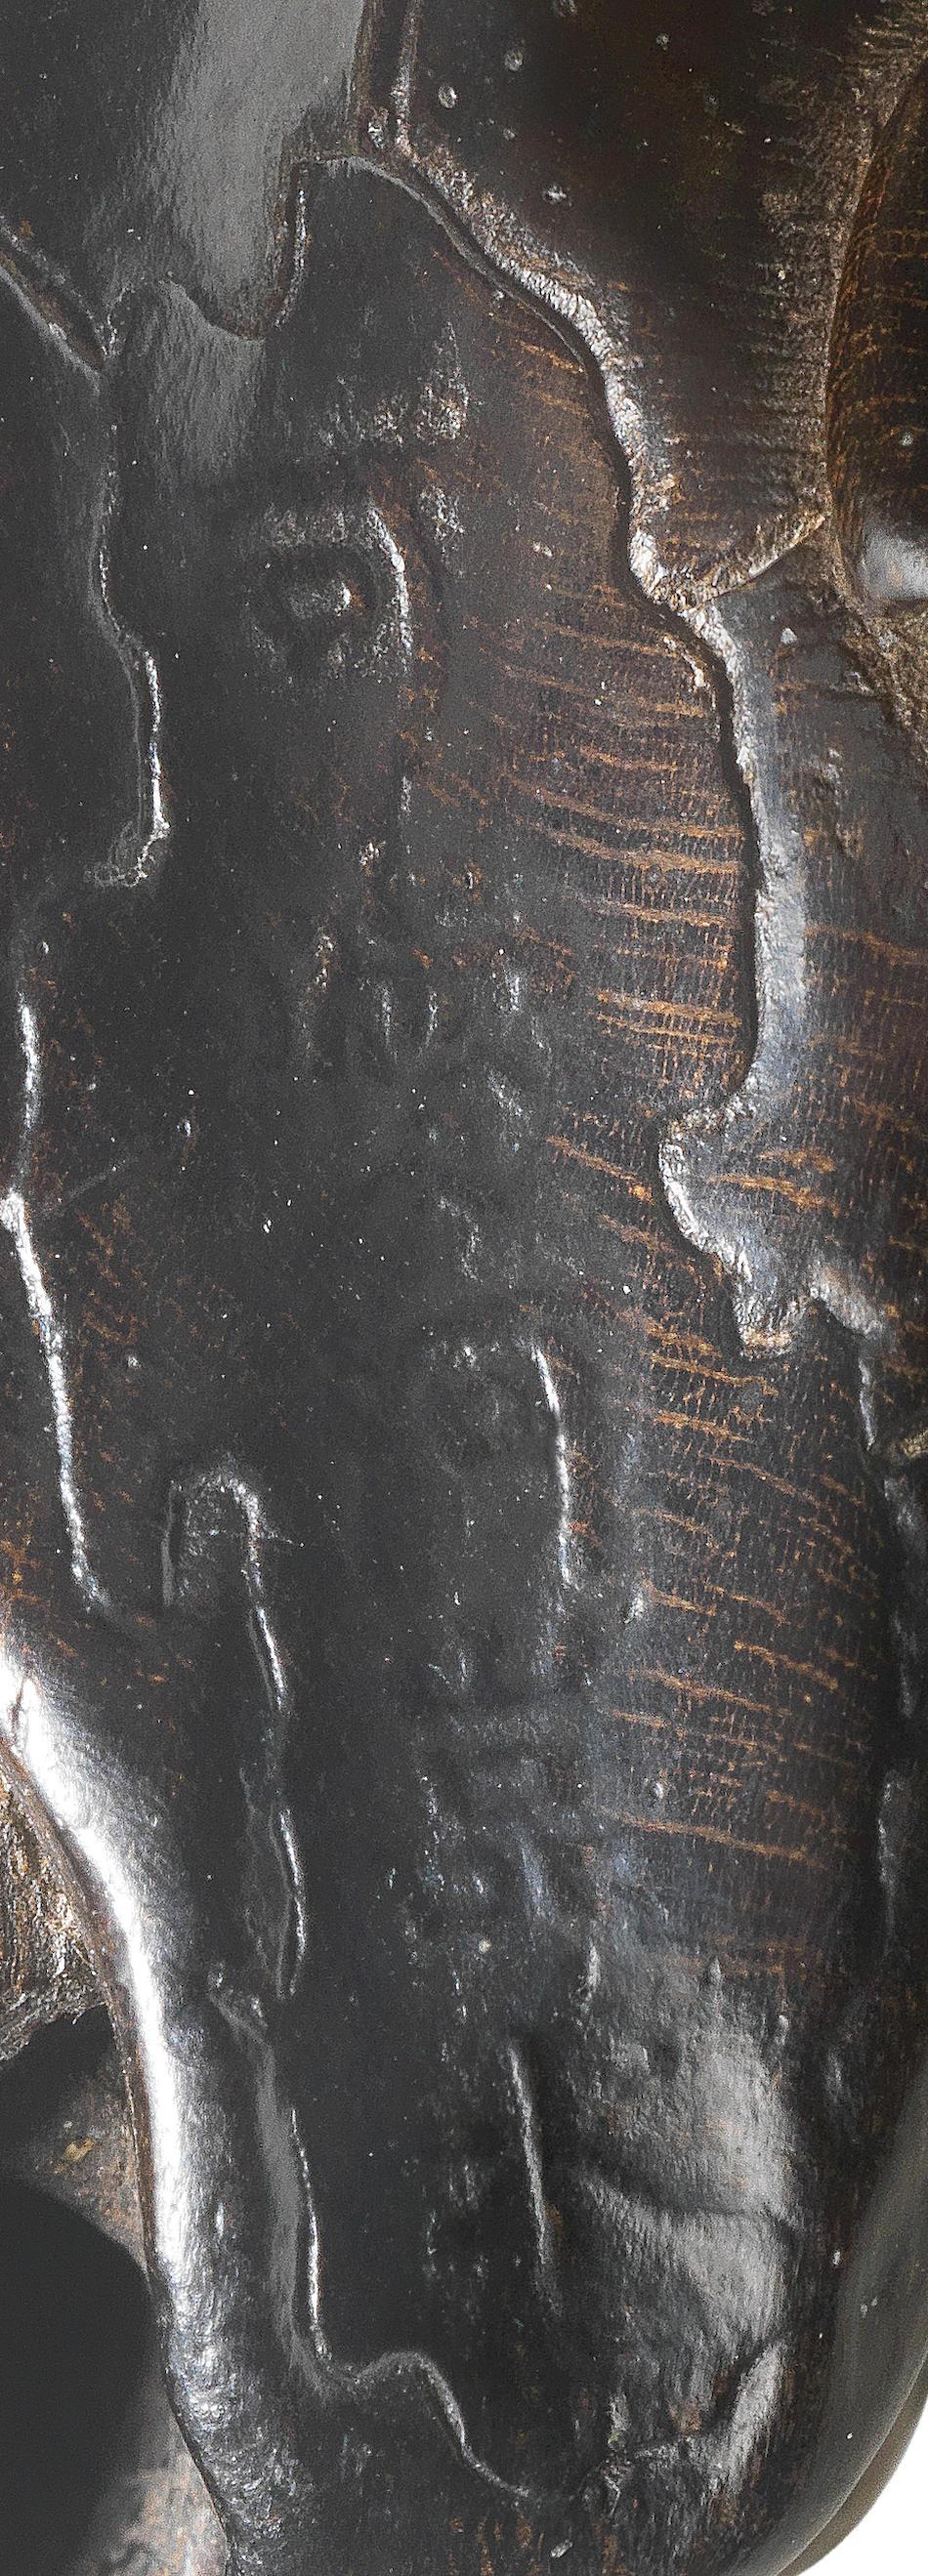 A kurogaki (black persimmon) wood netsuke of a Buddha's hand citron By Seiyodo Gansui (1809-1848), early 19th century